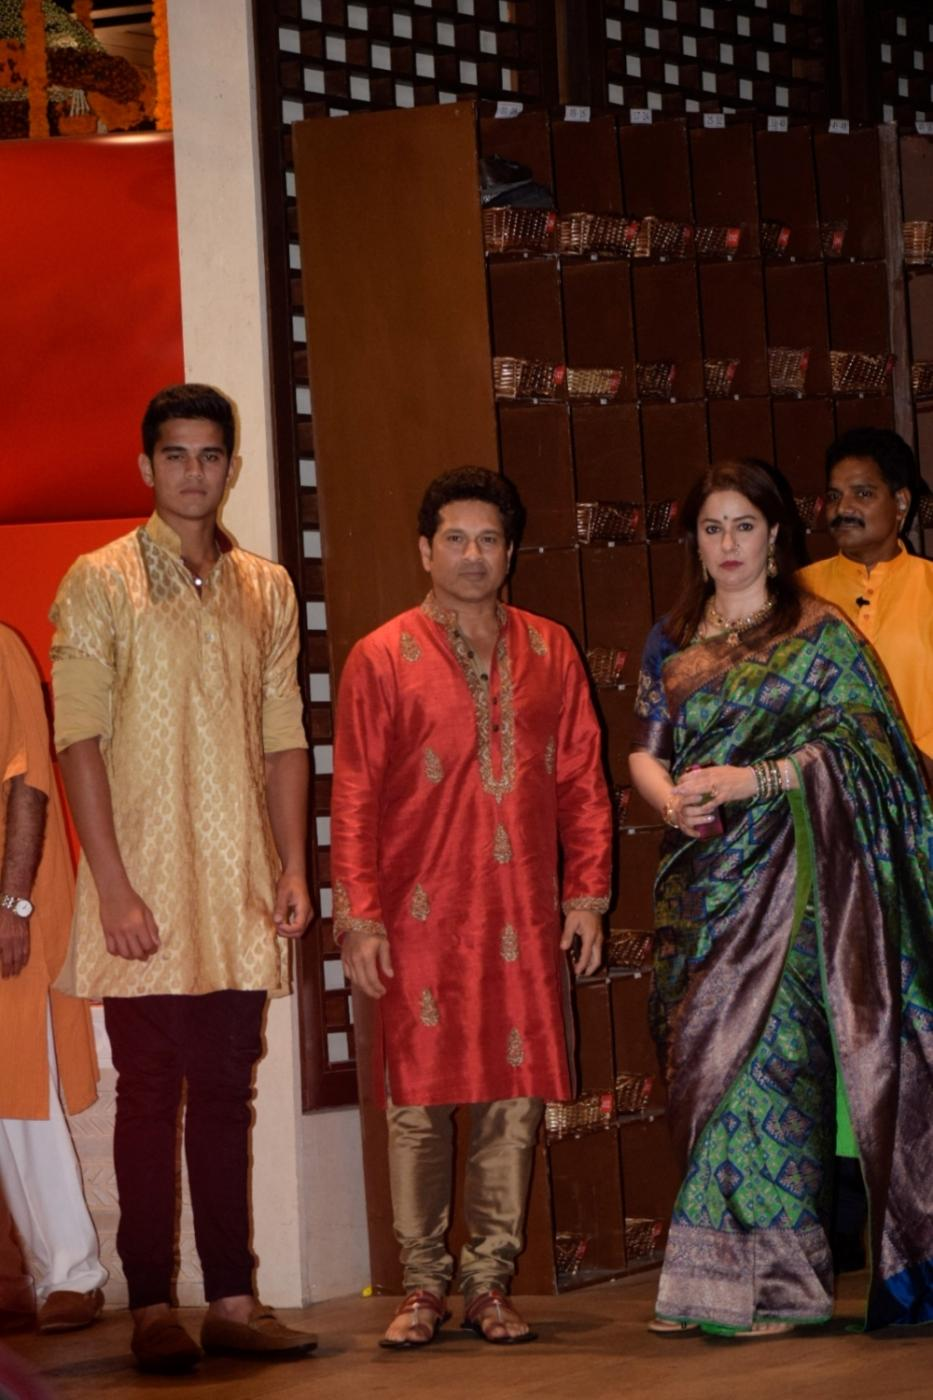 Mumbai: Former cricketer Sachin Tendulkar along with his wife Anjali Tendulkar and son Arjun Tendulkar at Reliance Industries Chairman and MD Mukesh Ambani's residence to celebrate Ganesh Chaturthi in Mumbai on Sept 13, 2018. (Photo: IANS) by .